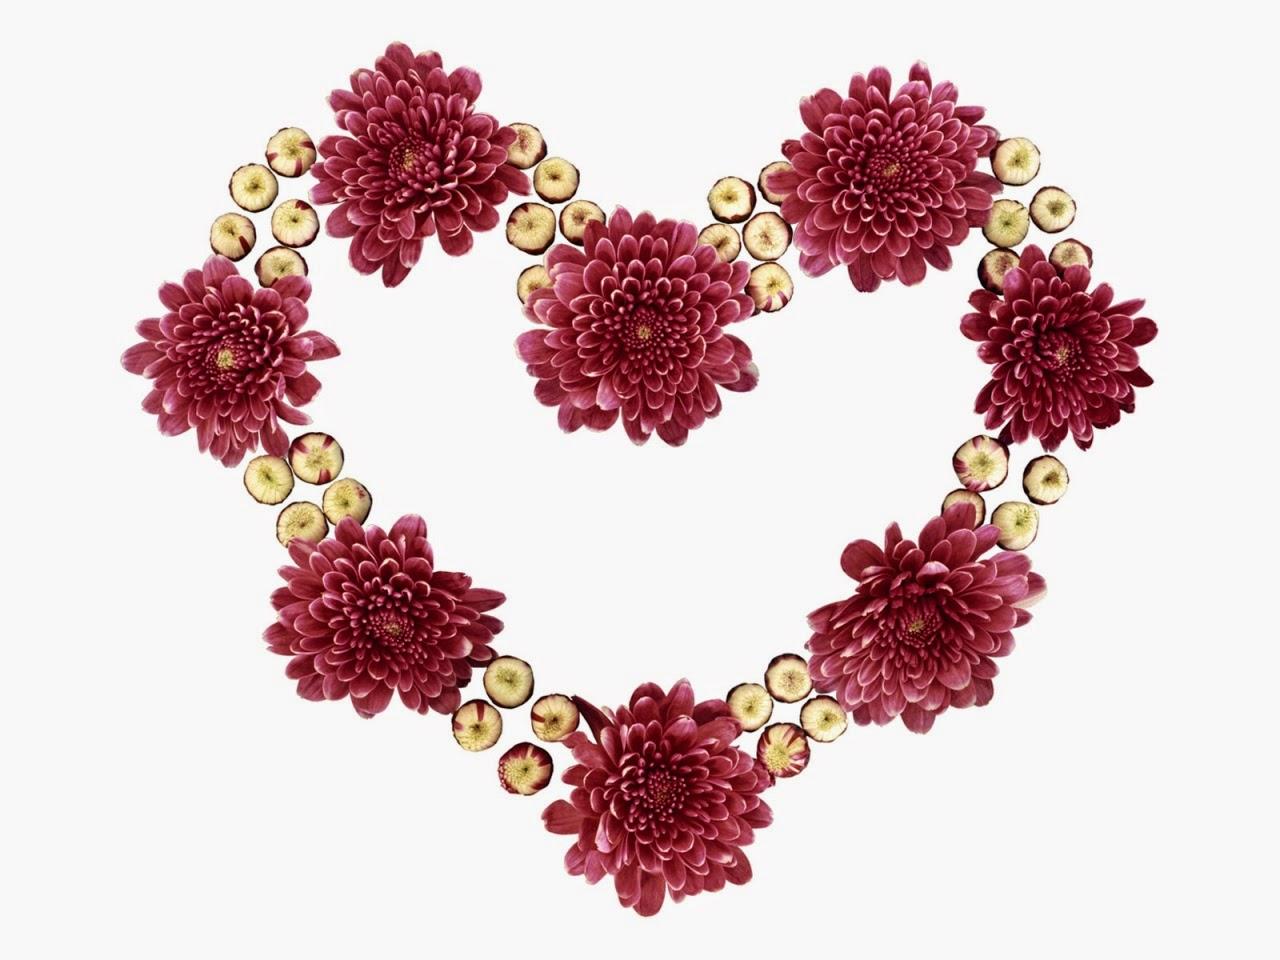 love heart shaped flowerflower -#main